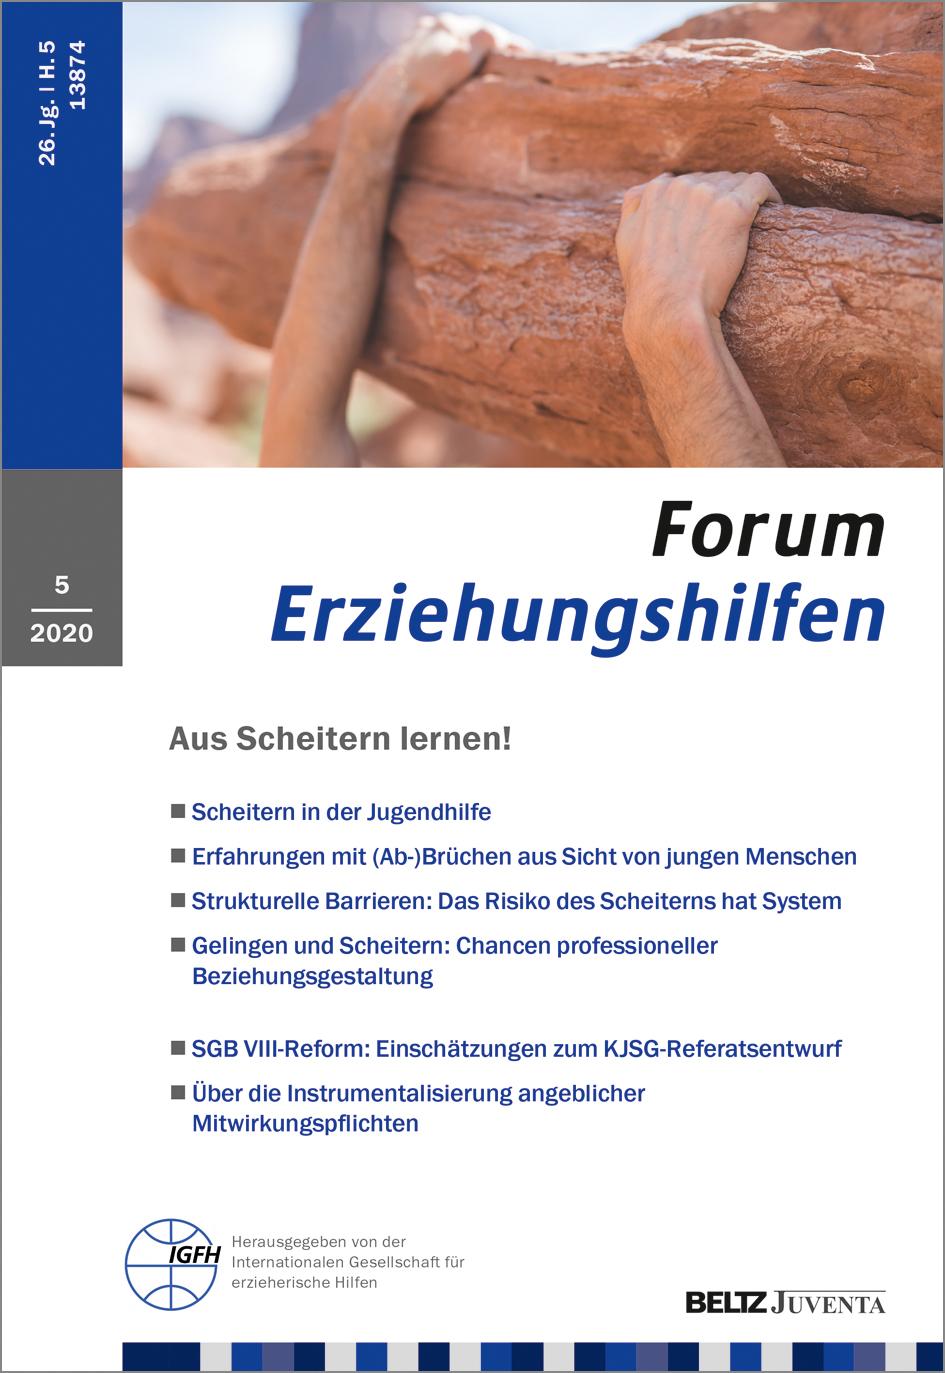 Forum Erziehungshilfen Beltz